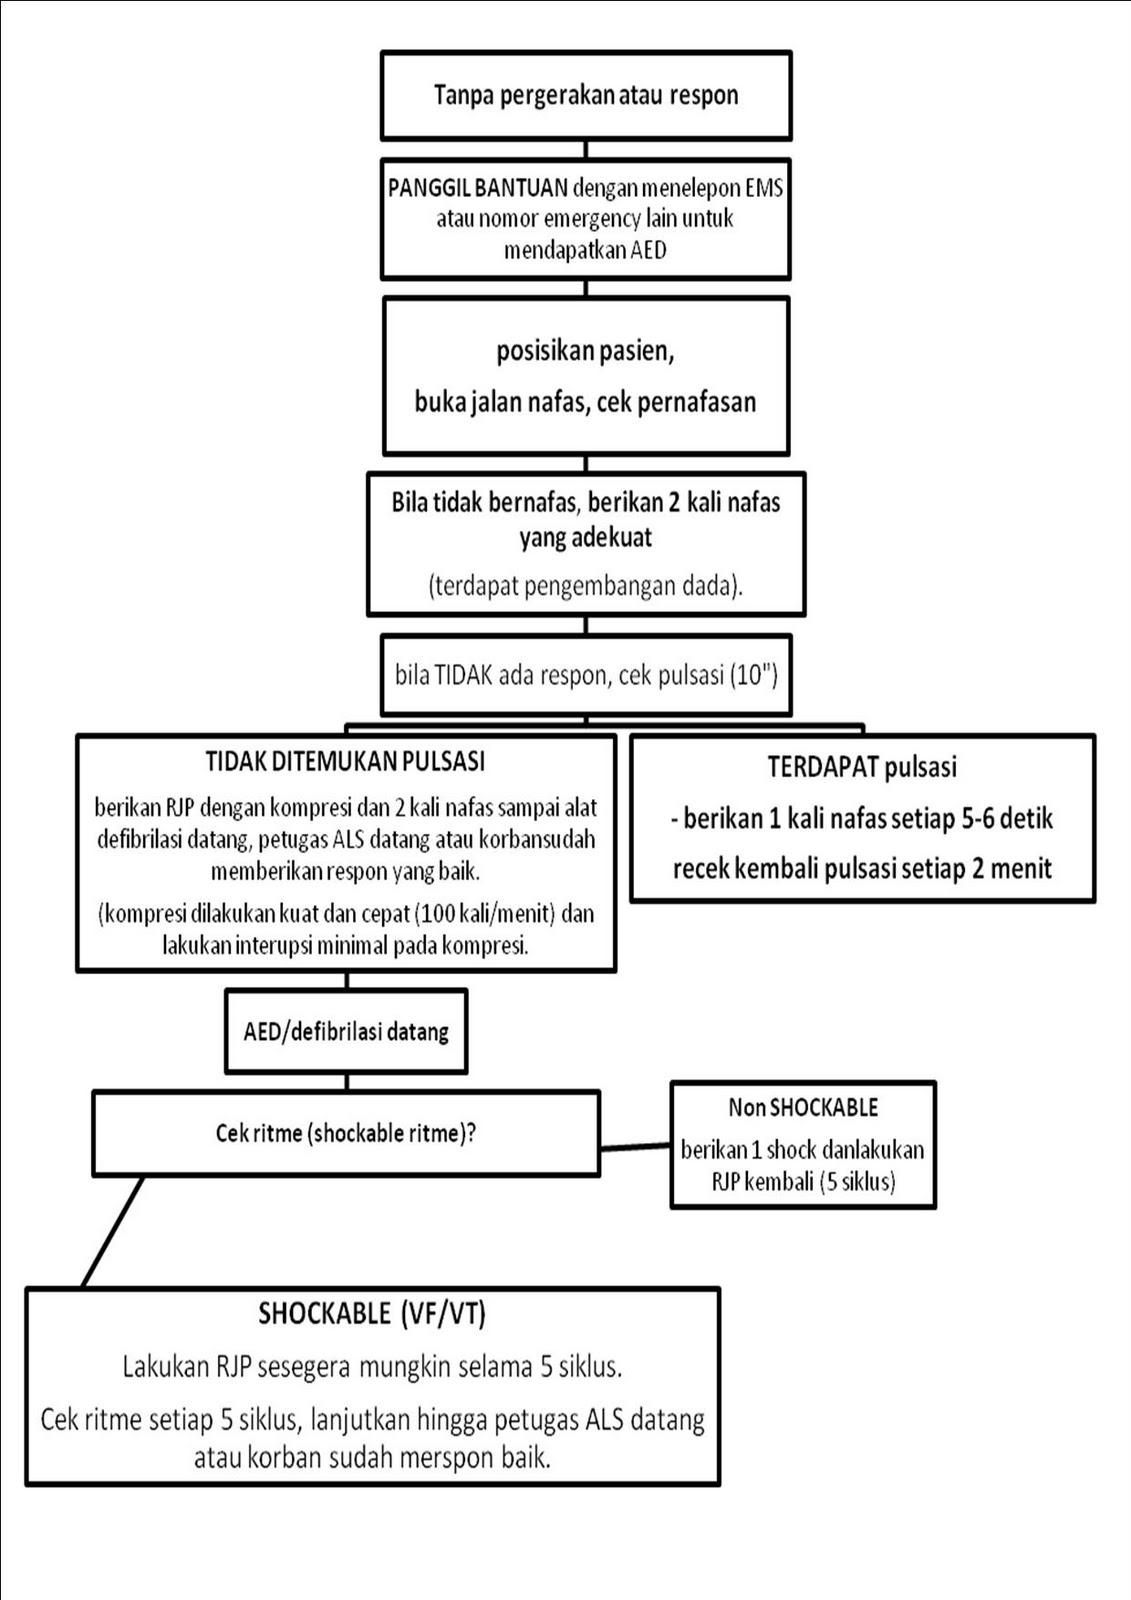 algoritma cardiac arrest